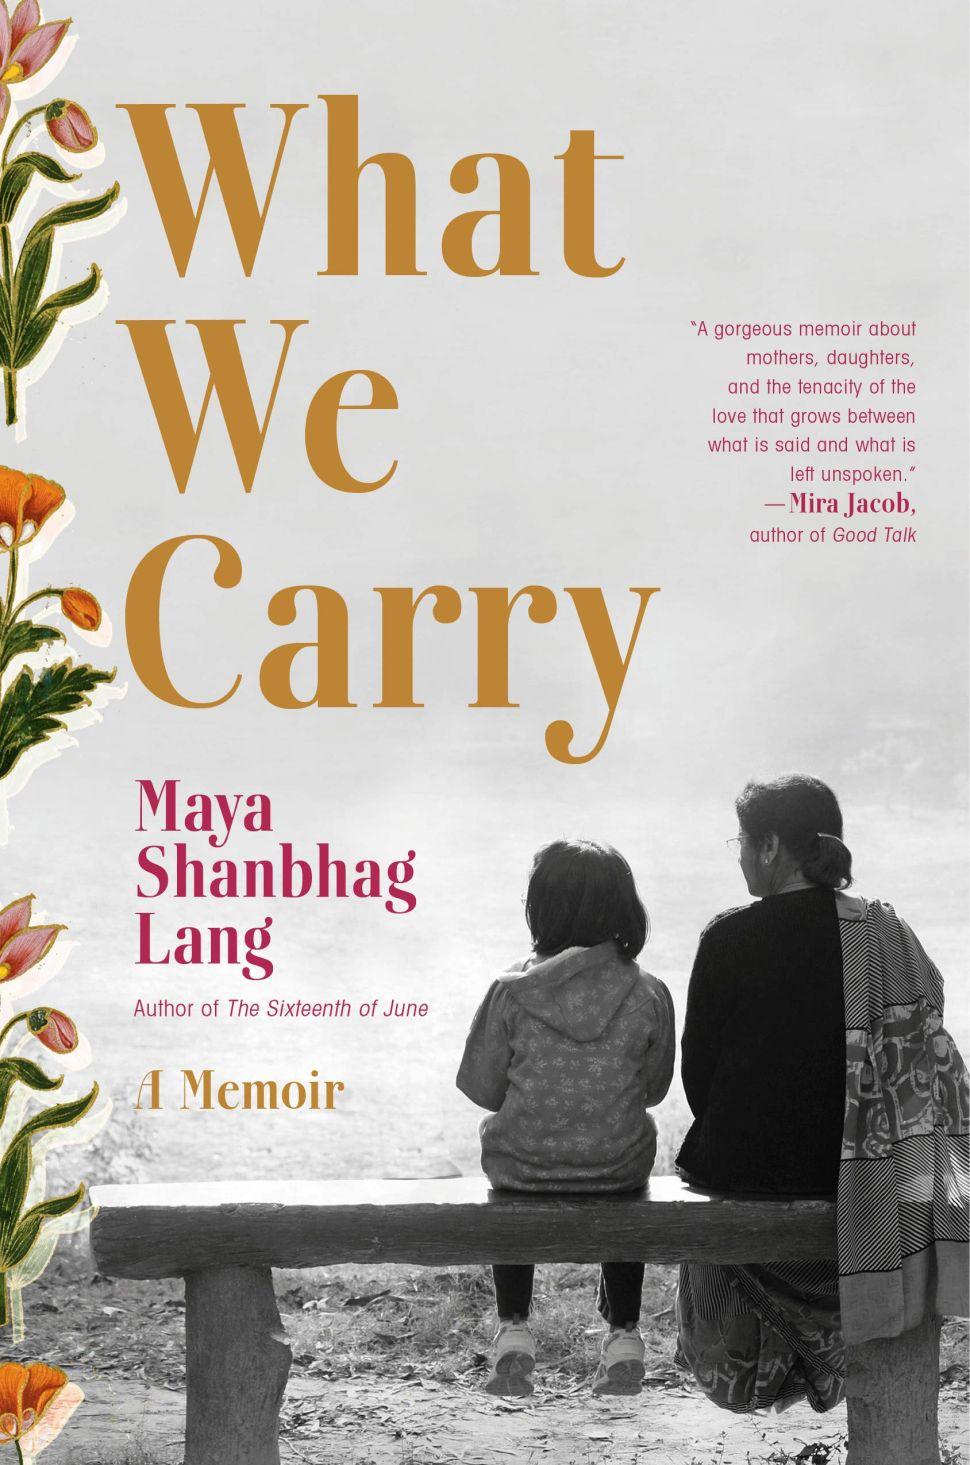 Mother-Daughter Memoir 'What We Carry' Asks Readers Not to Judge